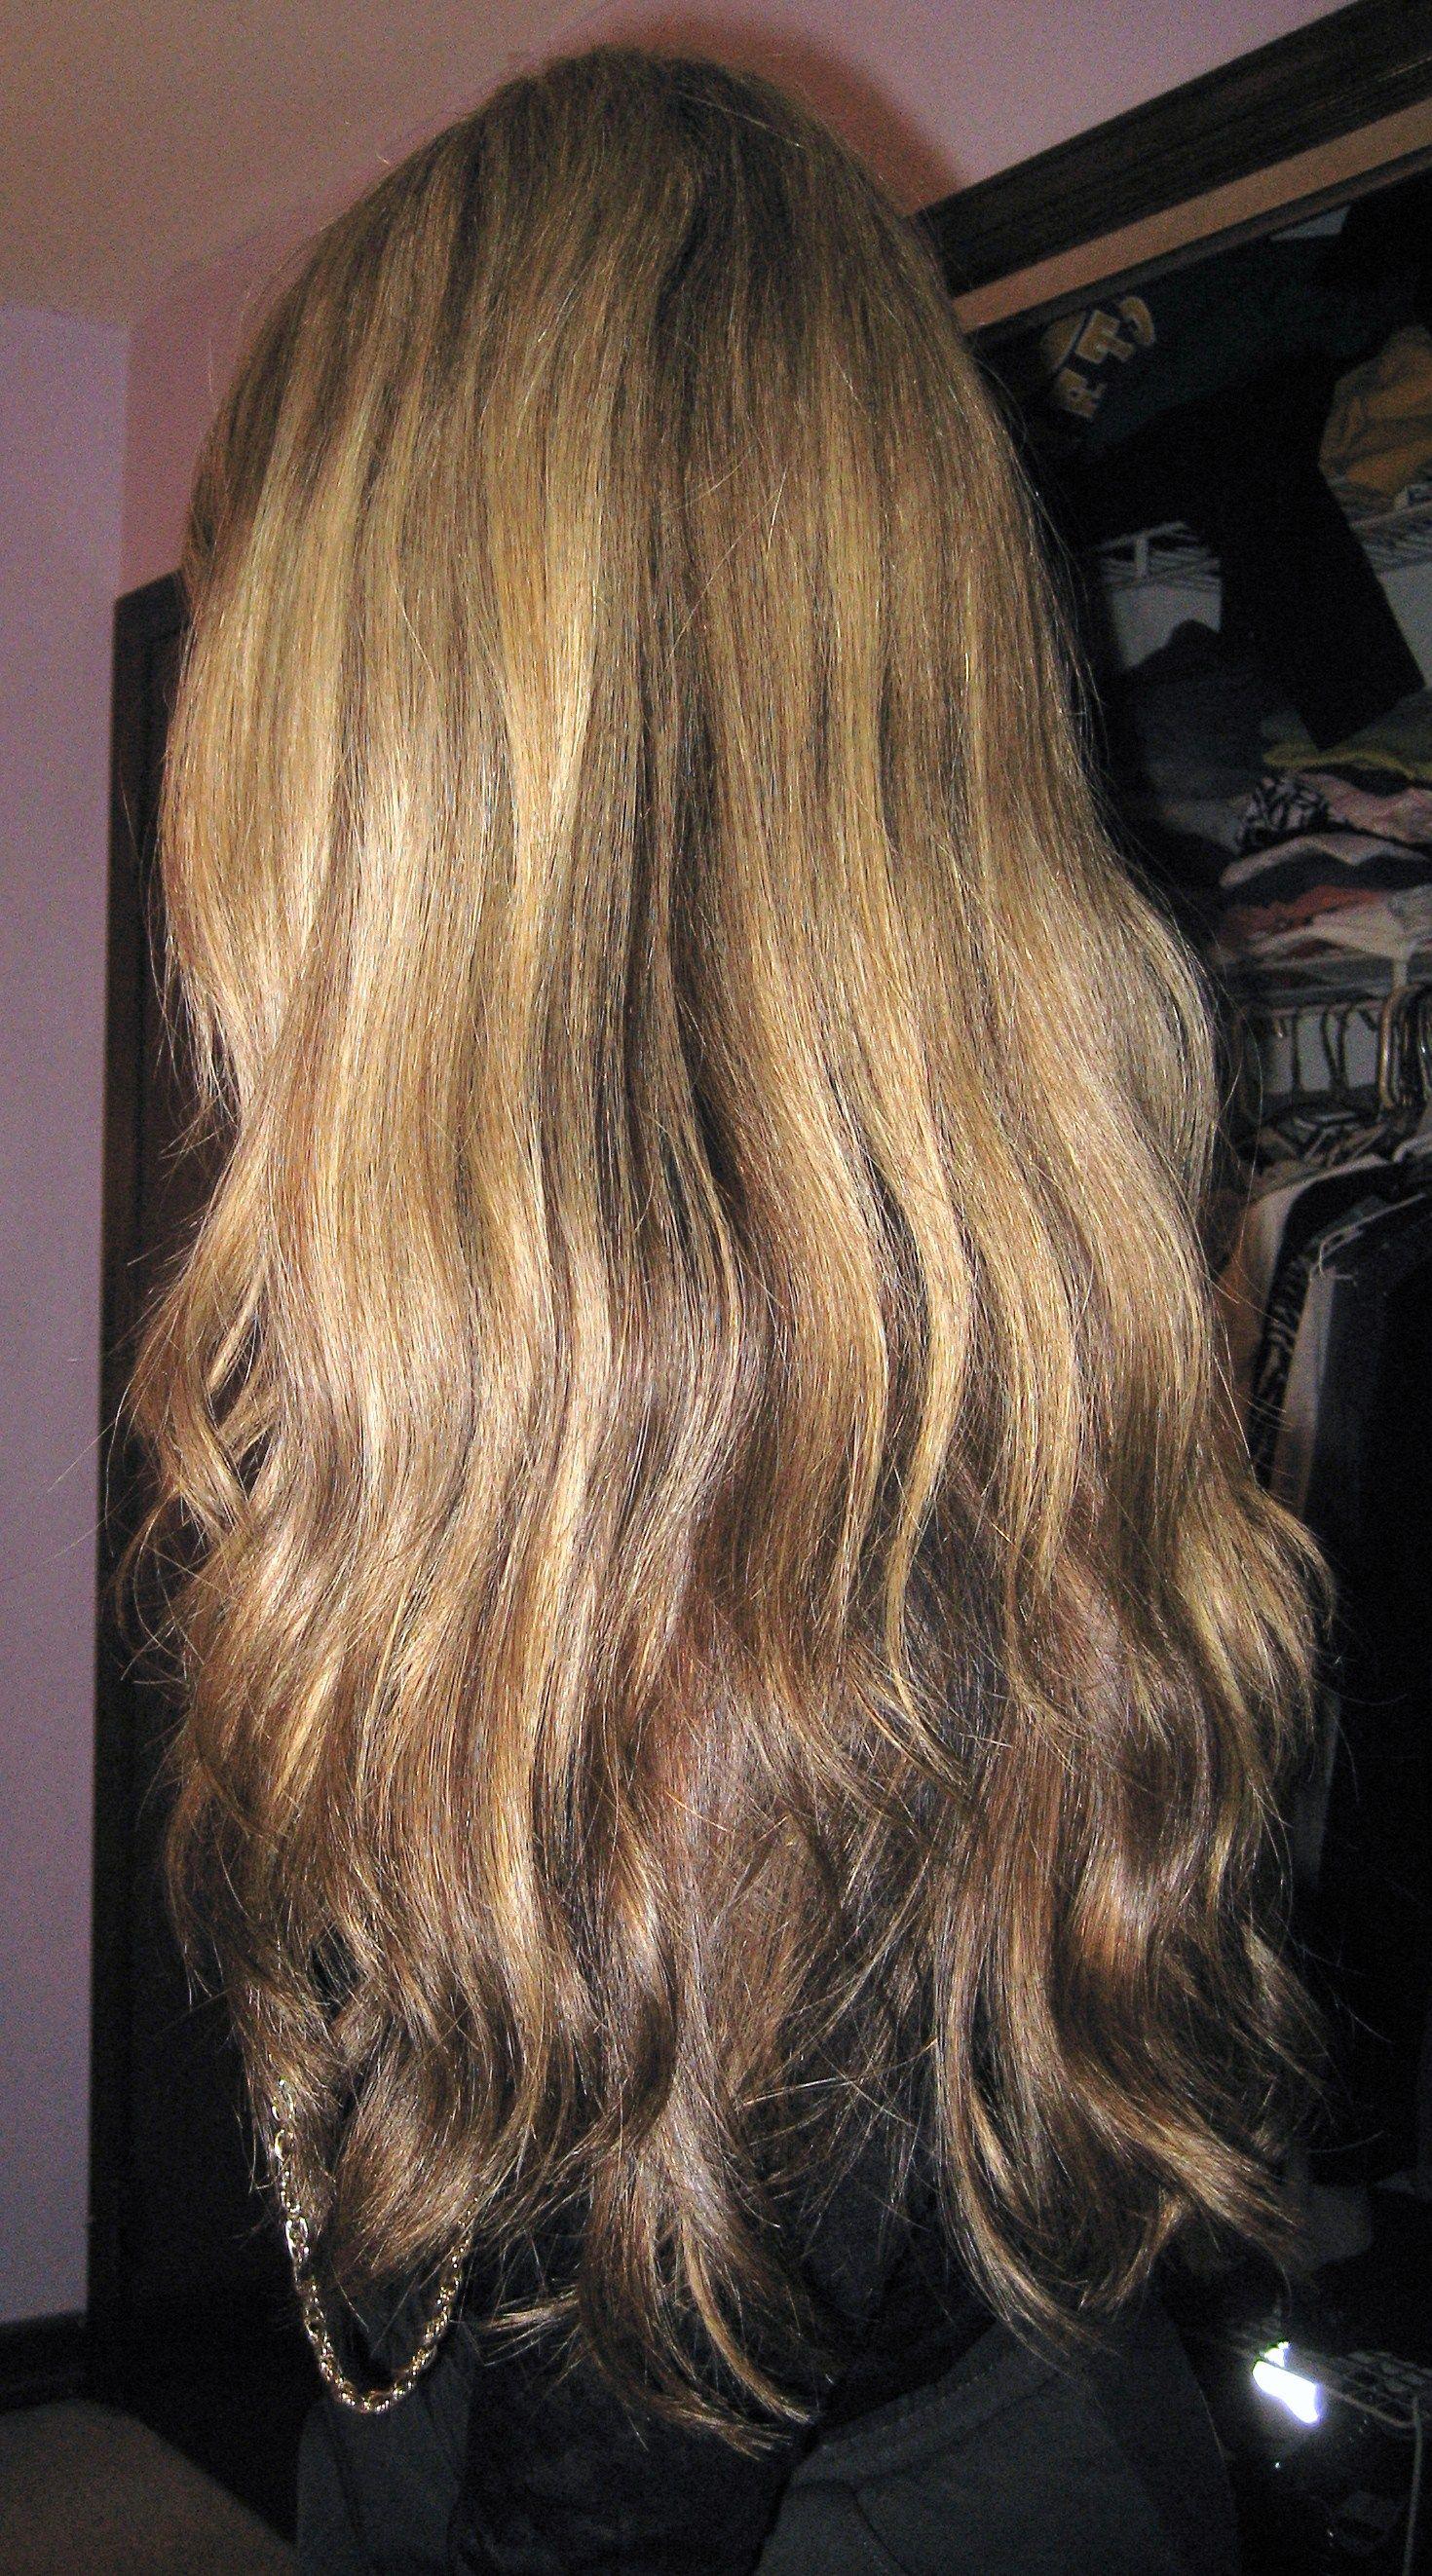 Long caramel hair